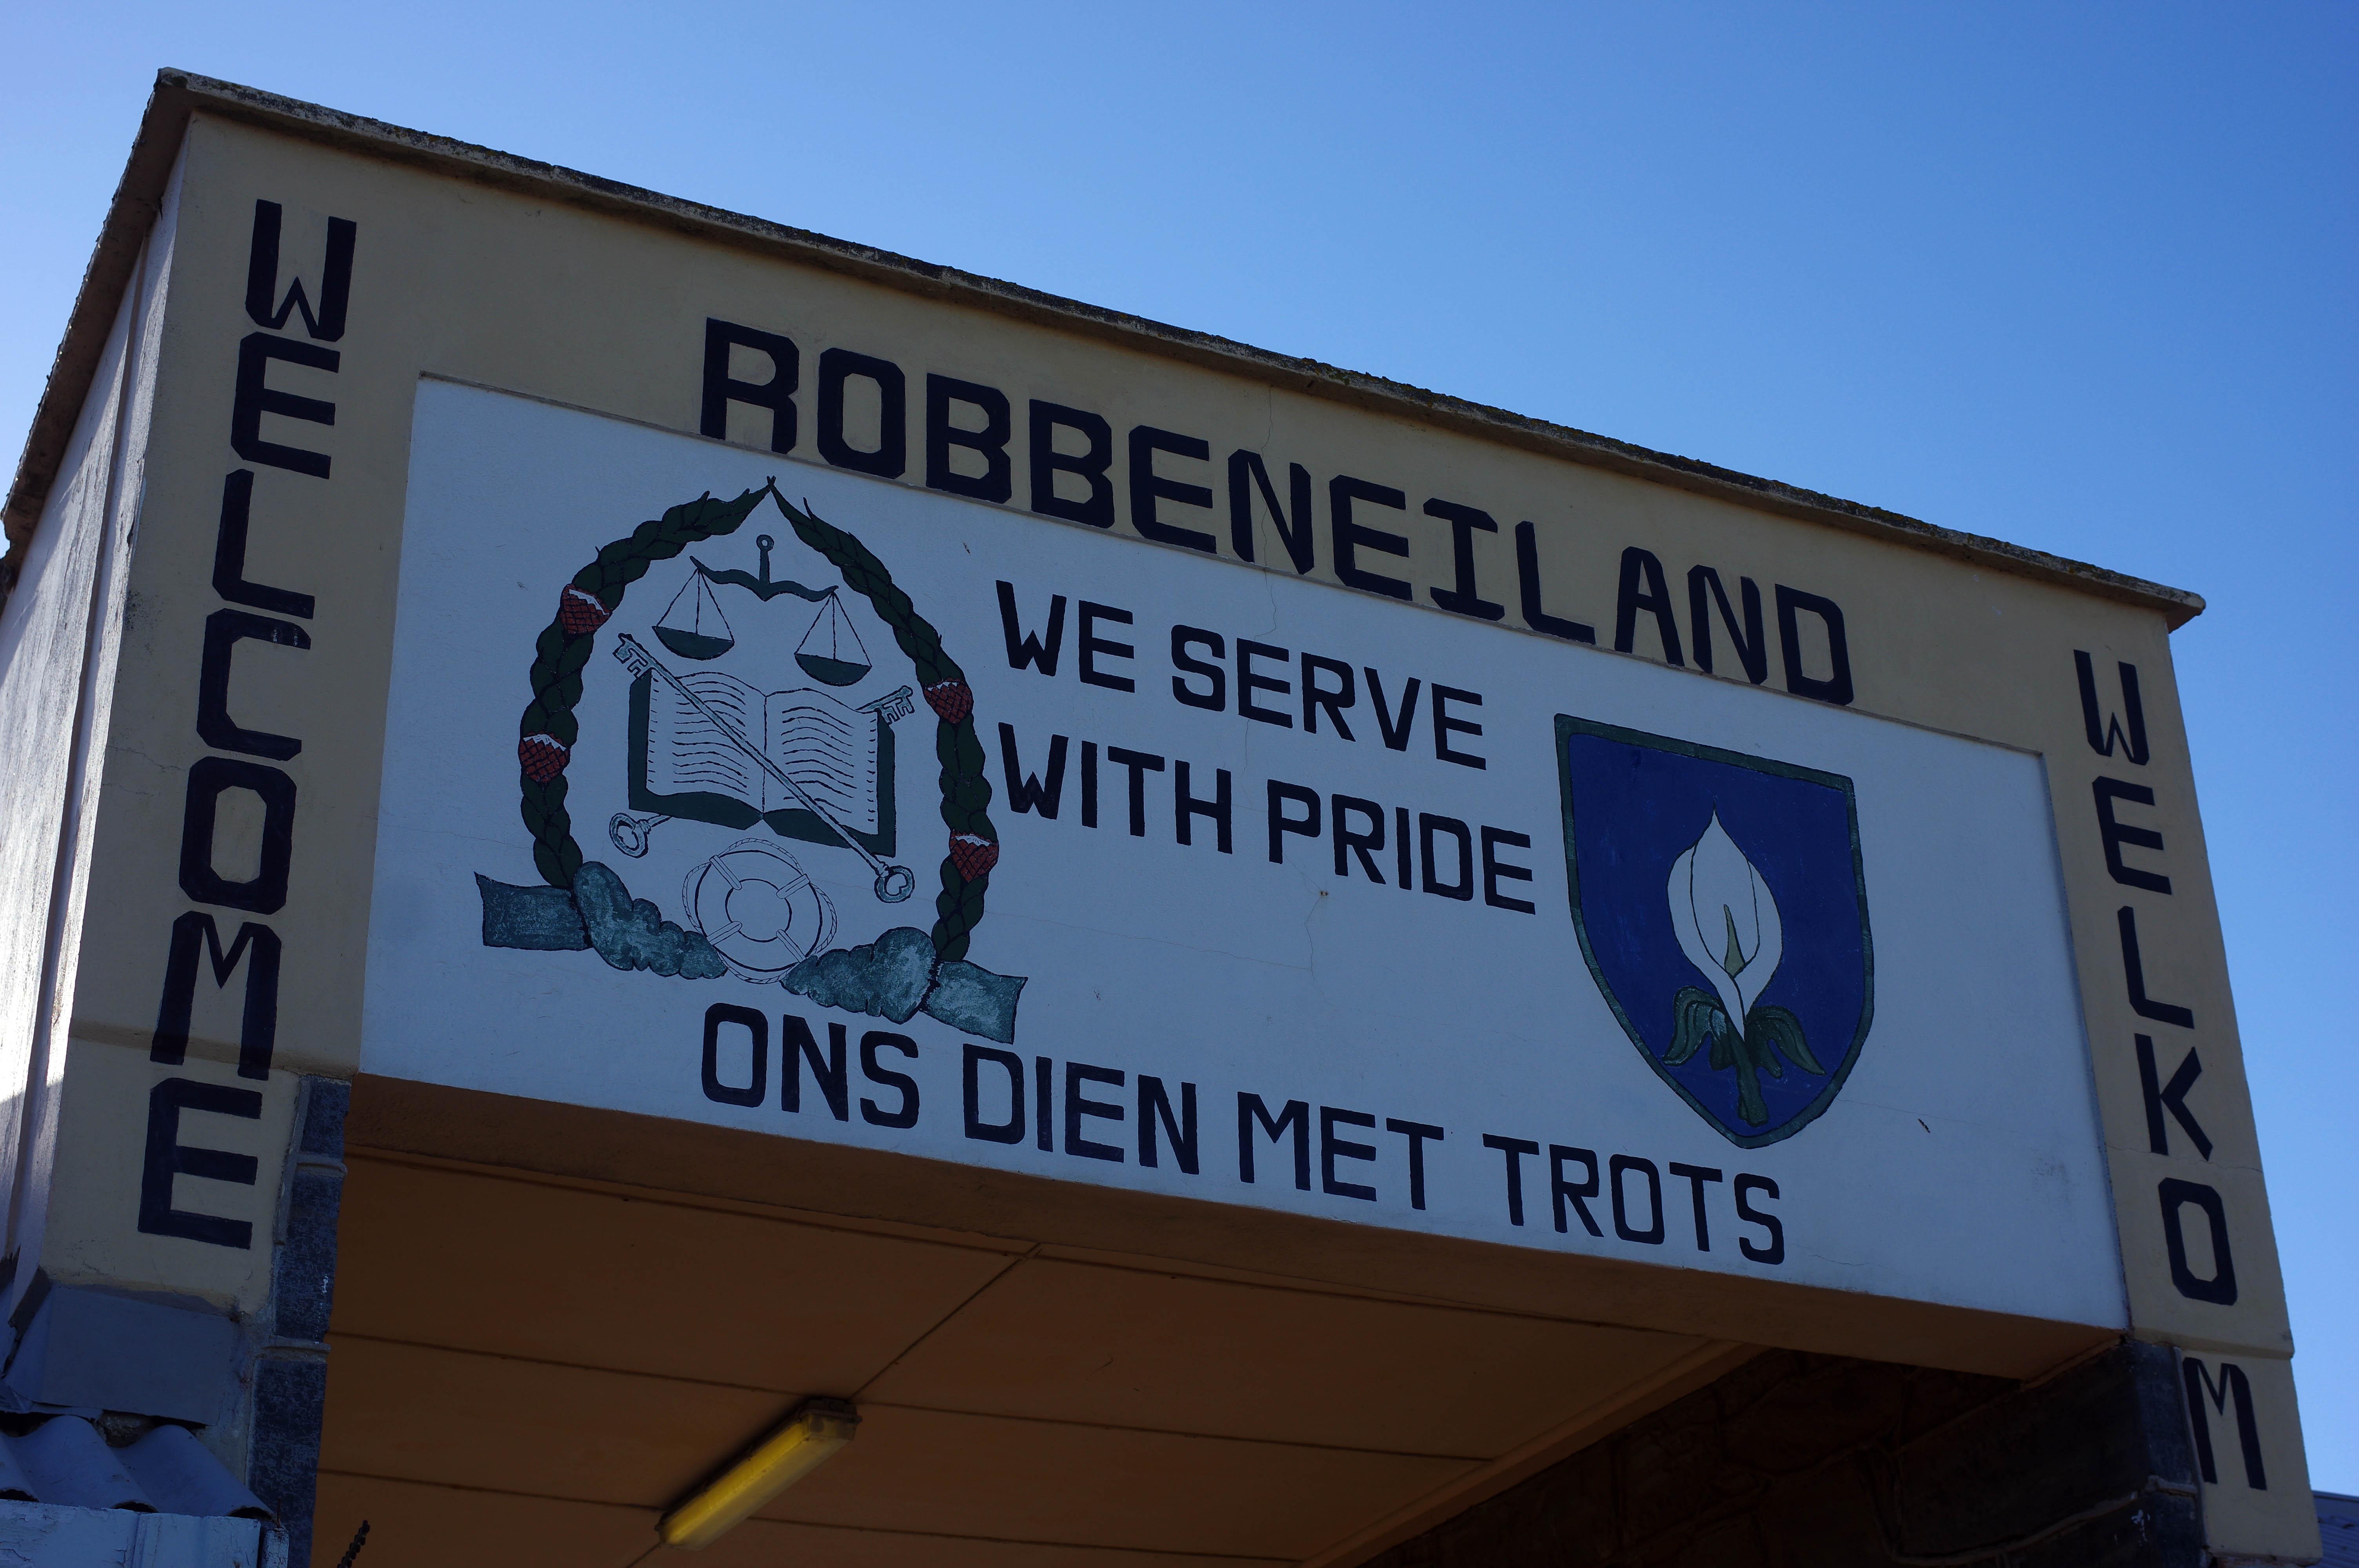 171122_CT_Robben island34